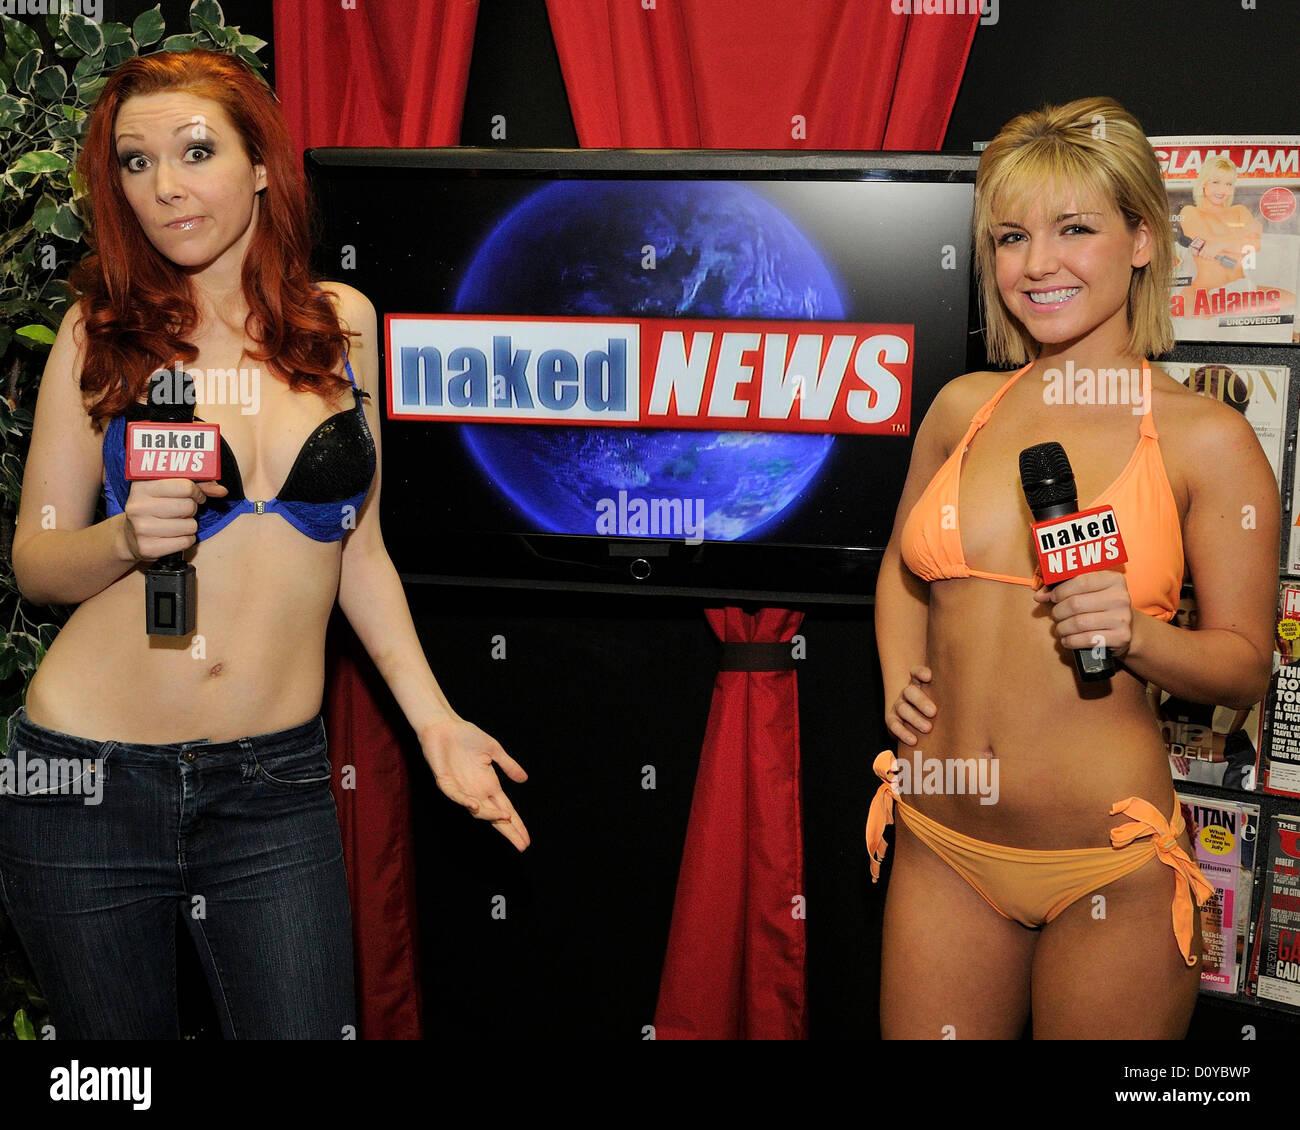 ThrowBackThursday - Naked News Stand Up | Yuk Yuks Blog